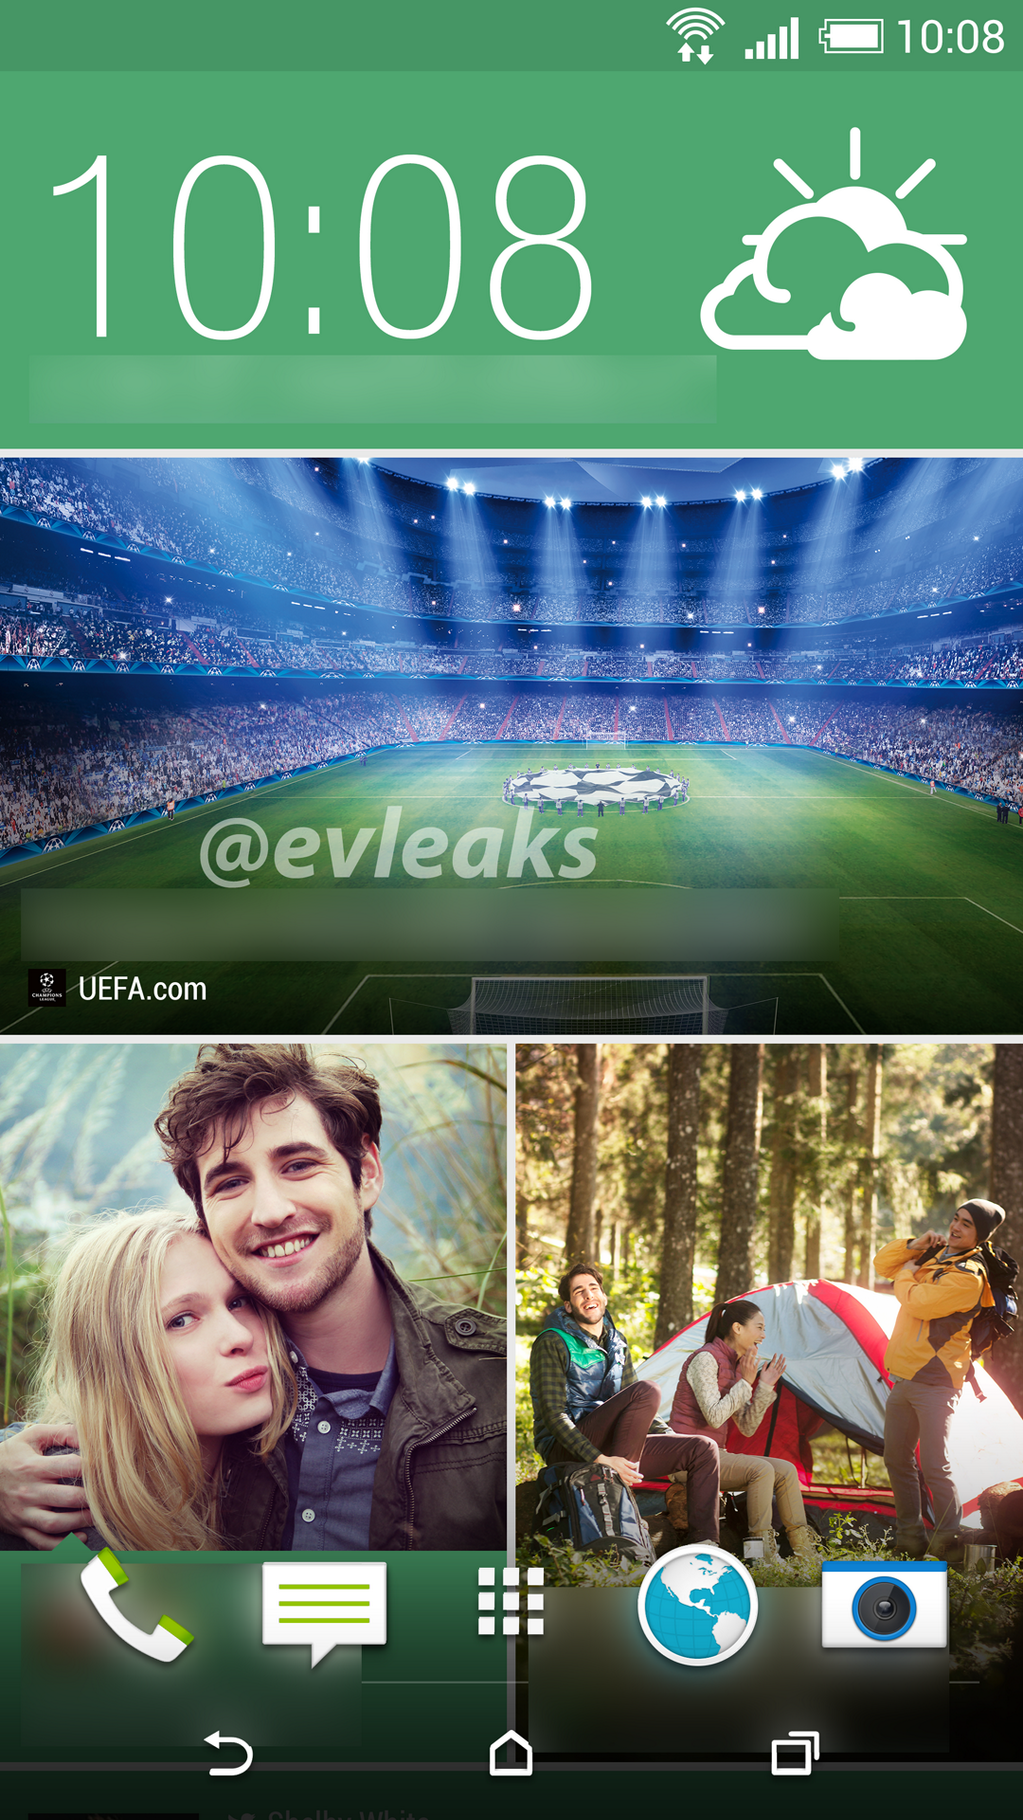 HTC_M8_One_2_screenshot_1.png